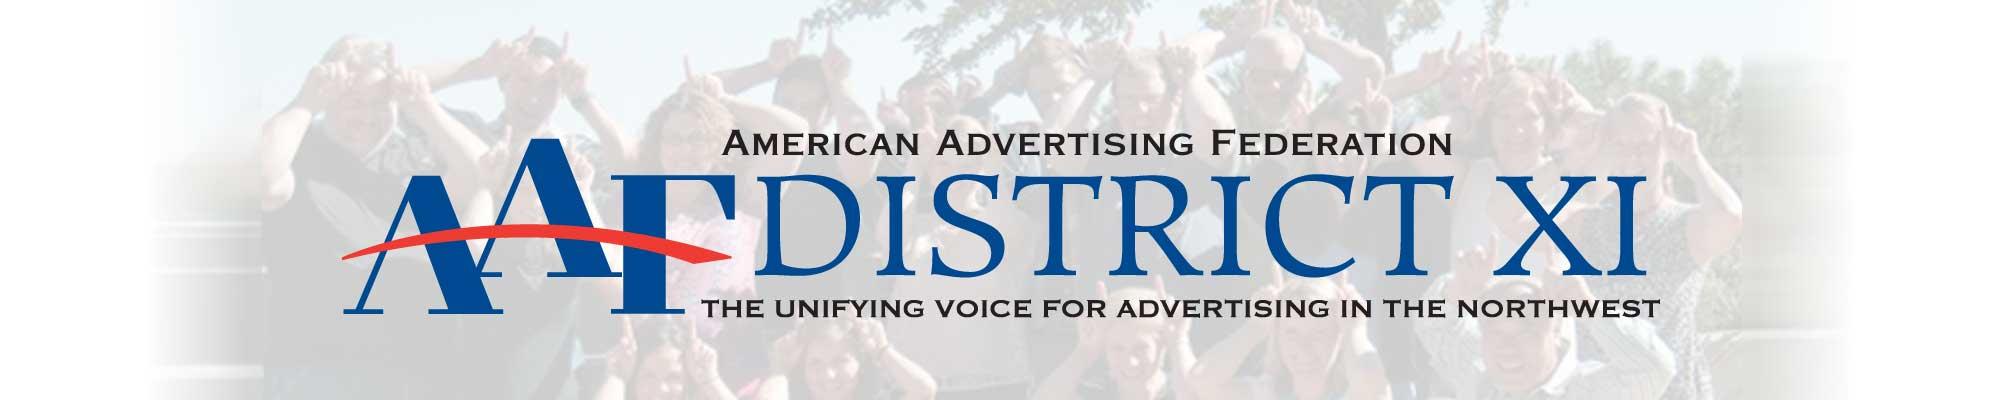 AAF District XI